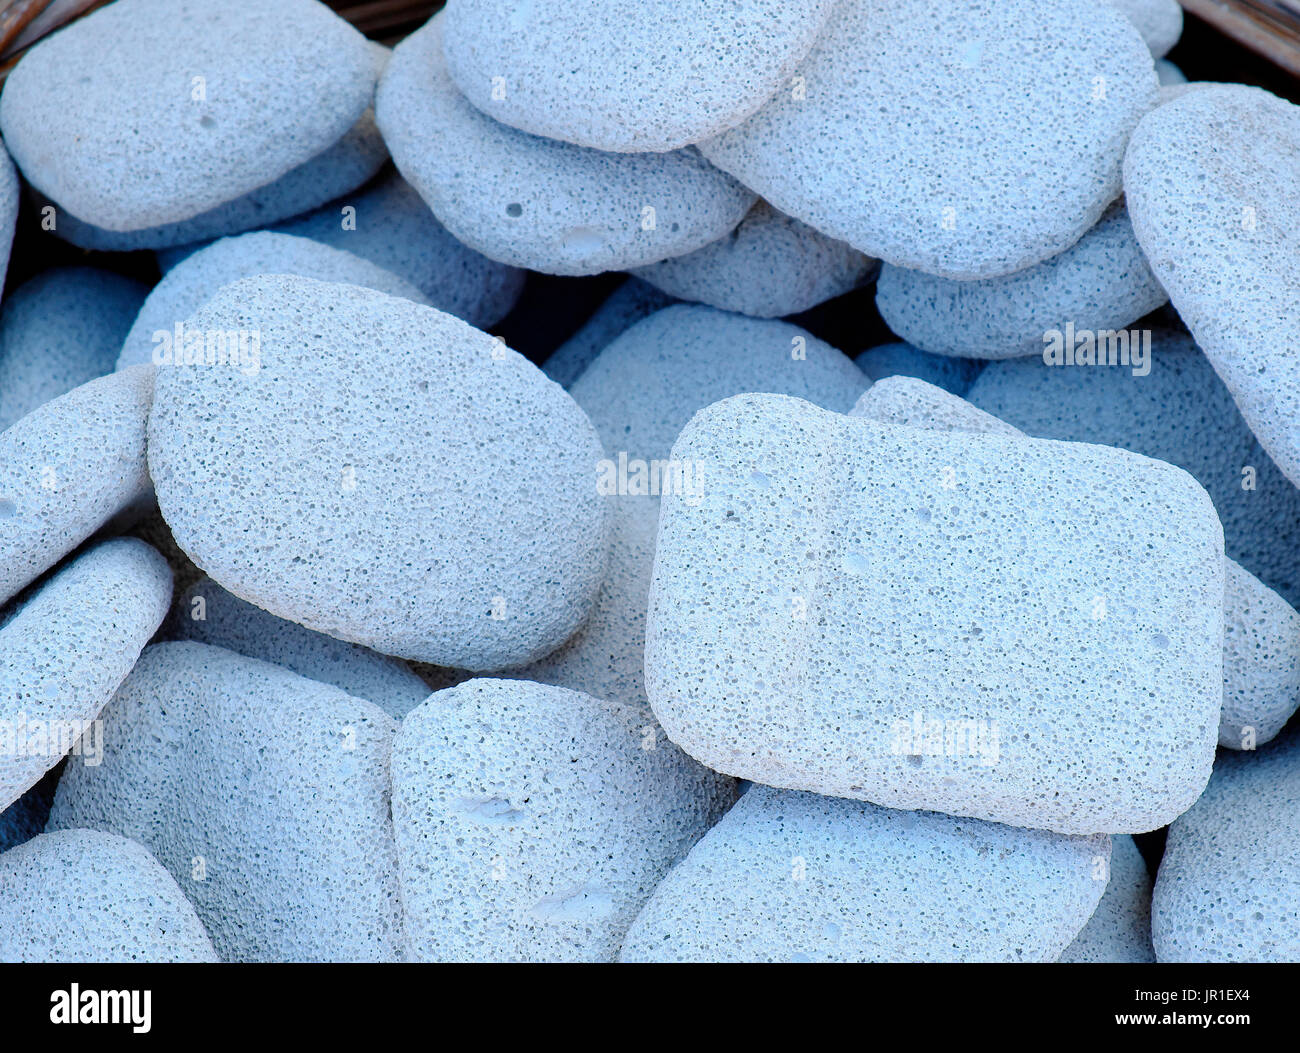 Natural volcanic pumice for sale, origin, Aegean Sea, Cyclades, Greece. - Stock Image